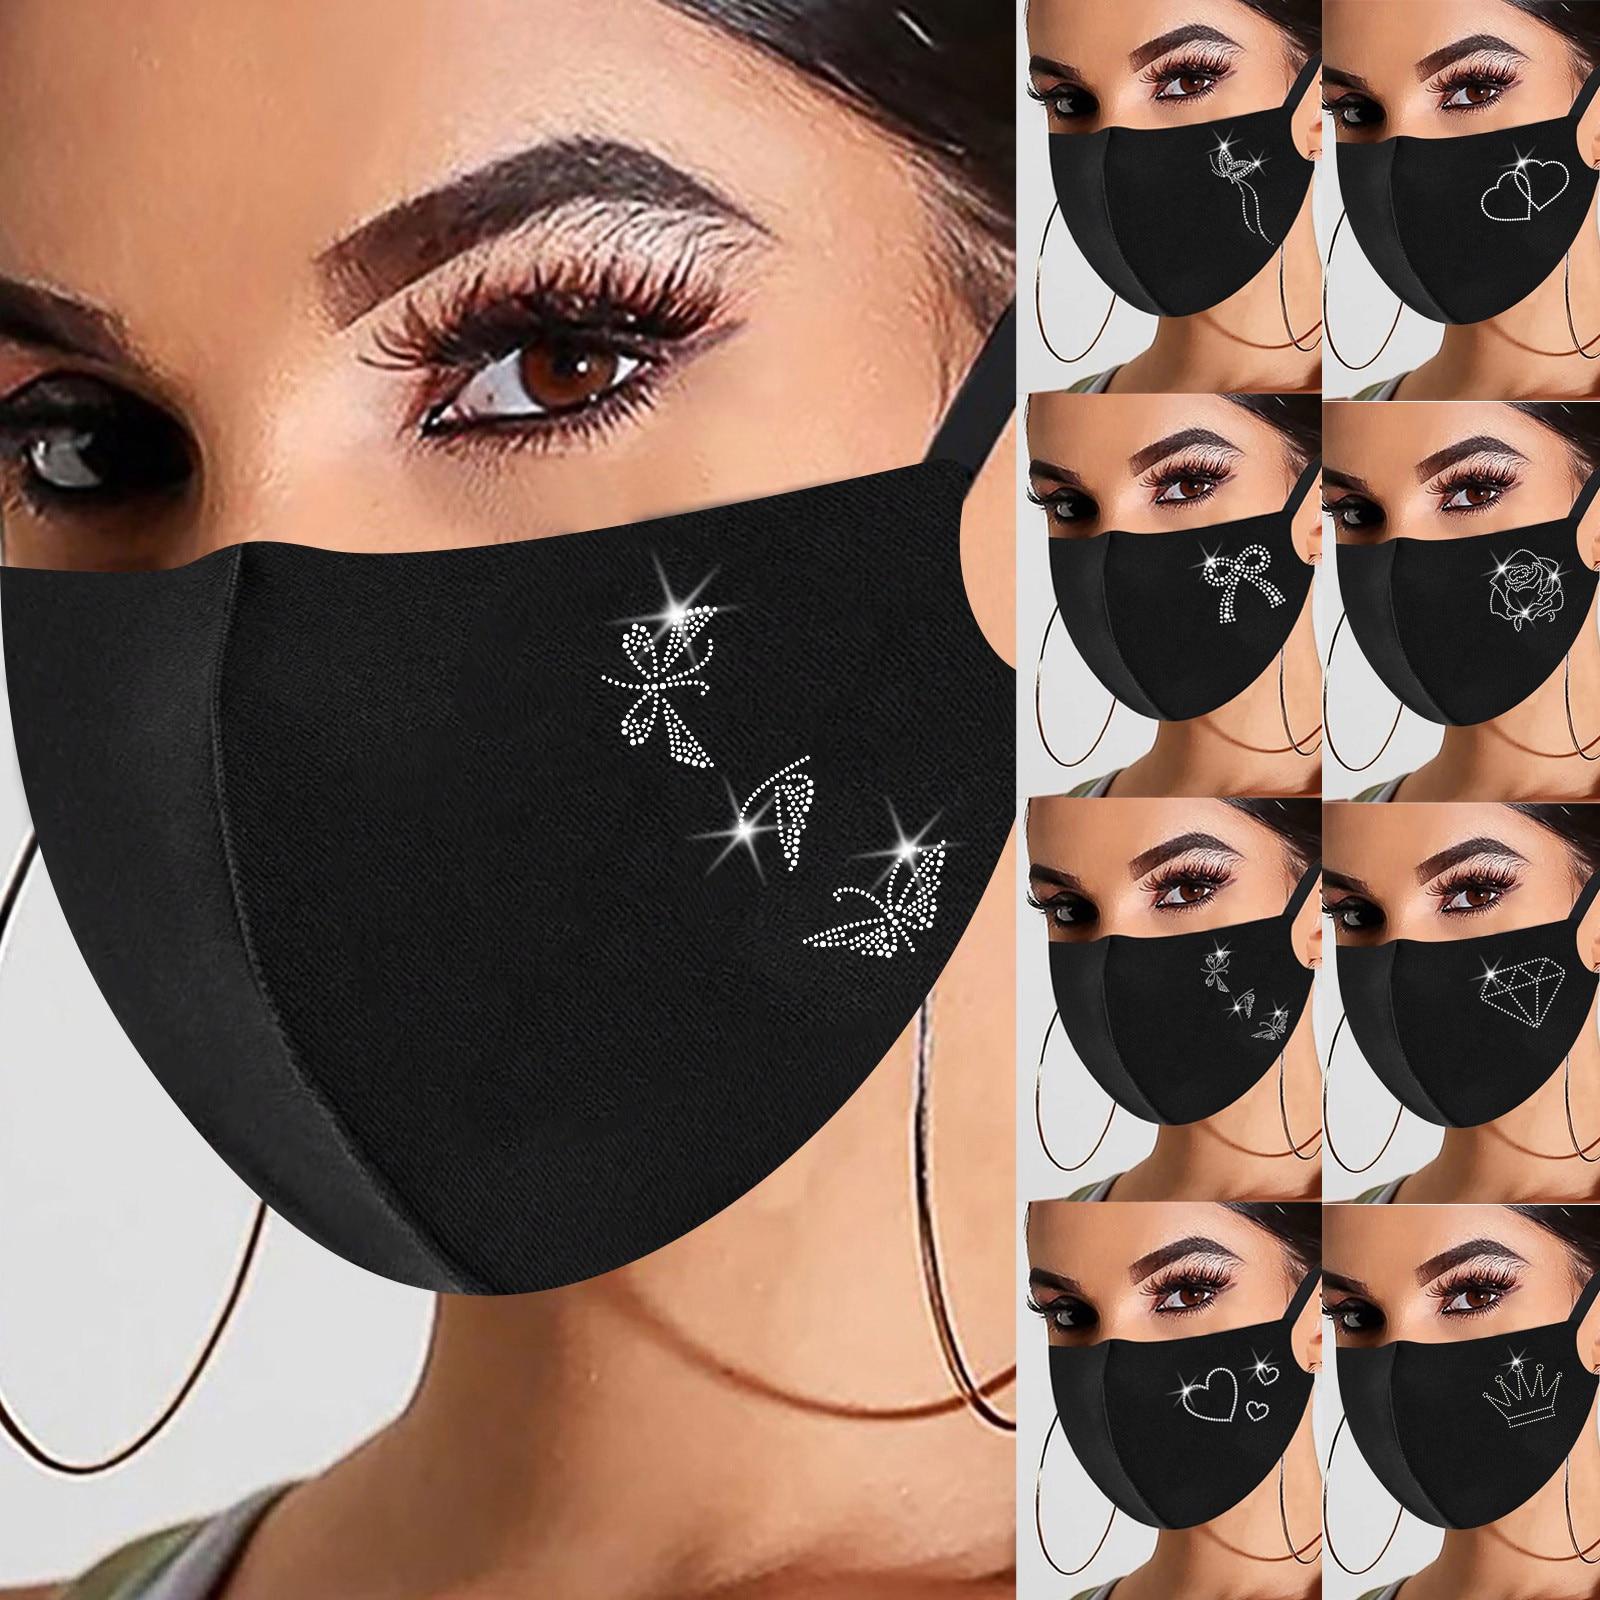 Headband masques 1PC Breathable Face Mask Women's Fashionable Hot Diamond Printing Mask Dust-proof M